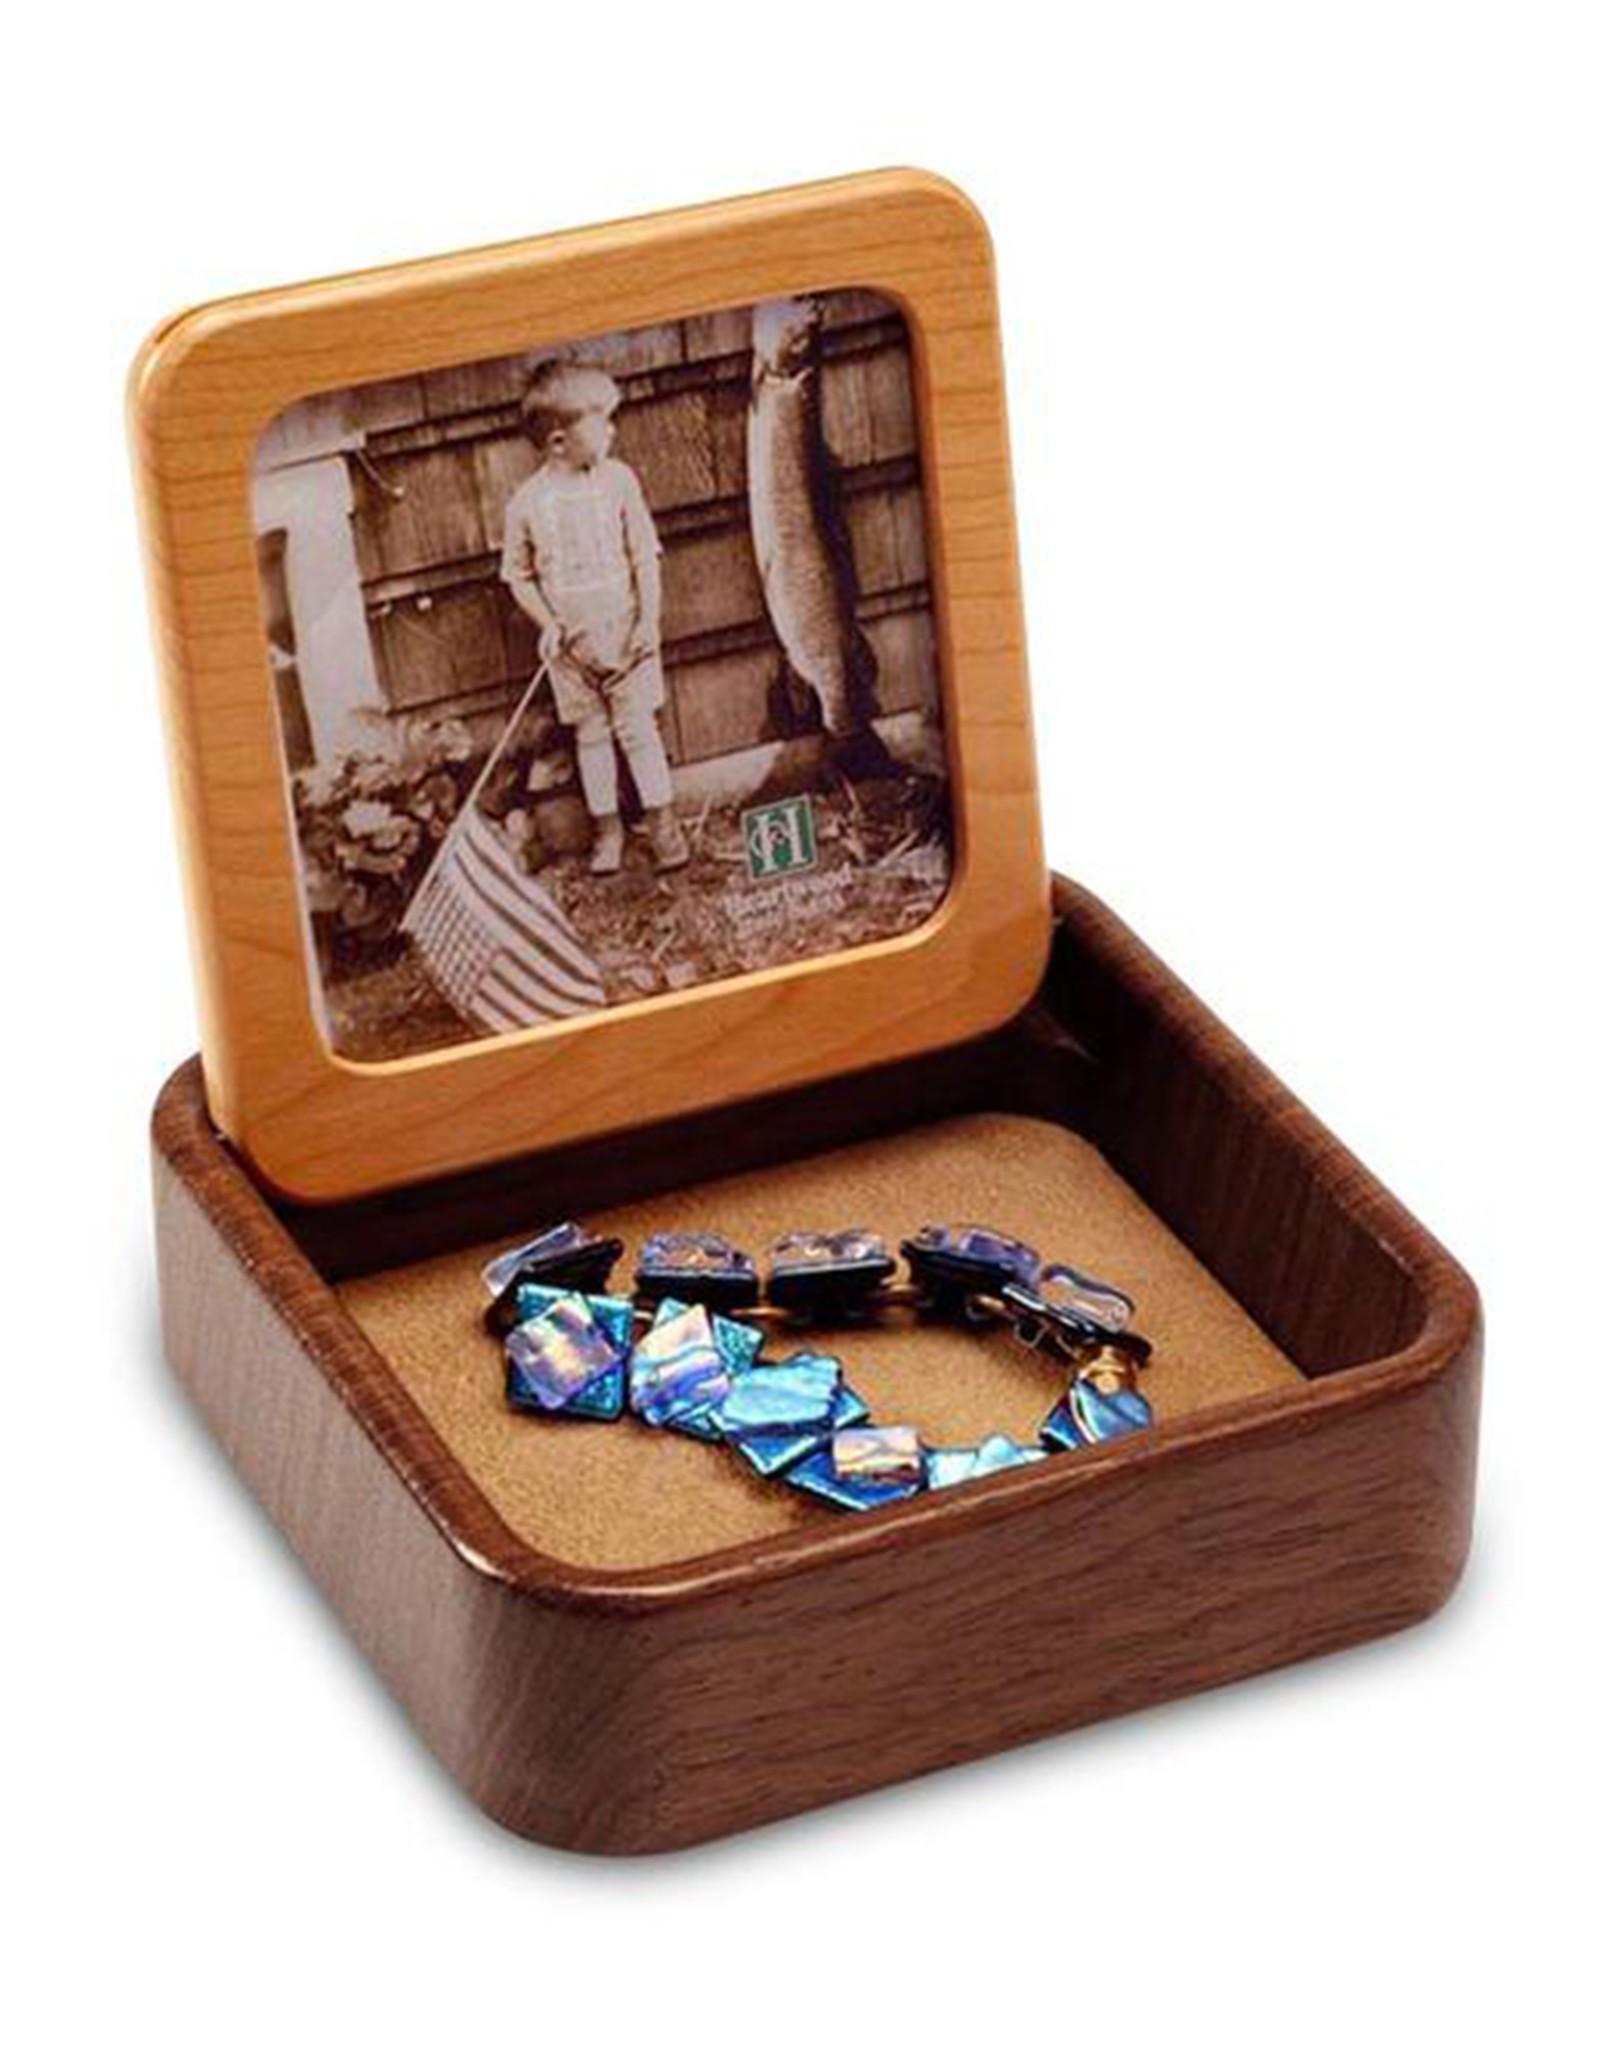 HEARTWOOD CREATIONS CATS FLIP-TOP PHOTO BOX